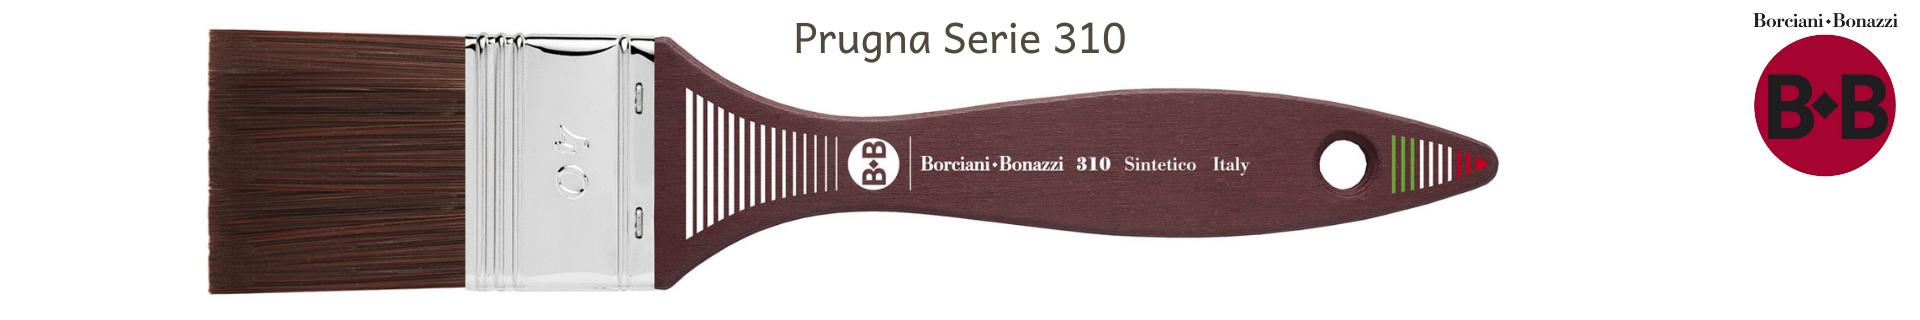 Borciani e Bonazzi Pennellessa Prugna 310